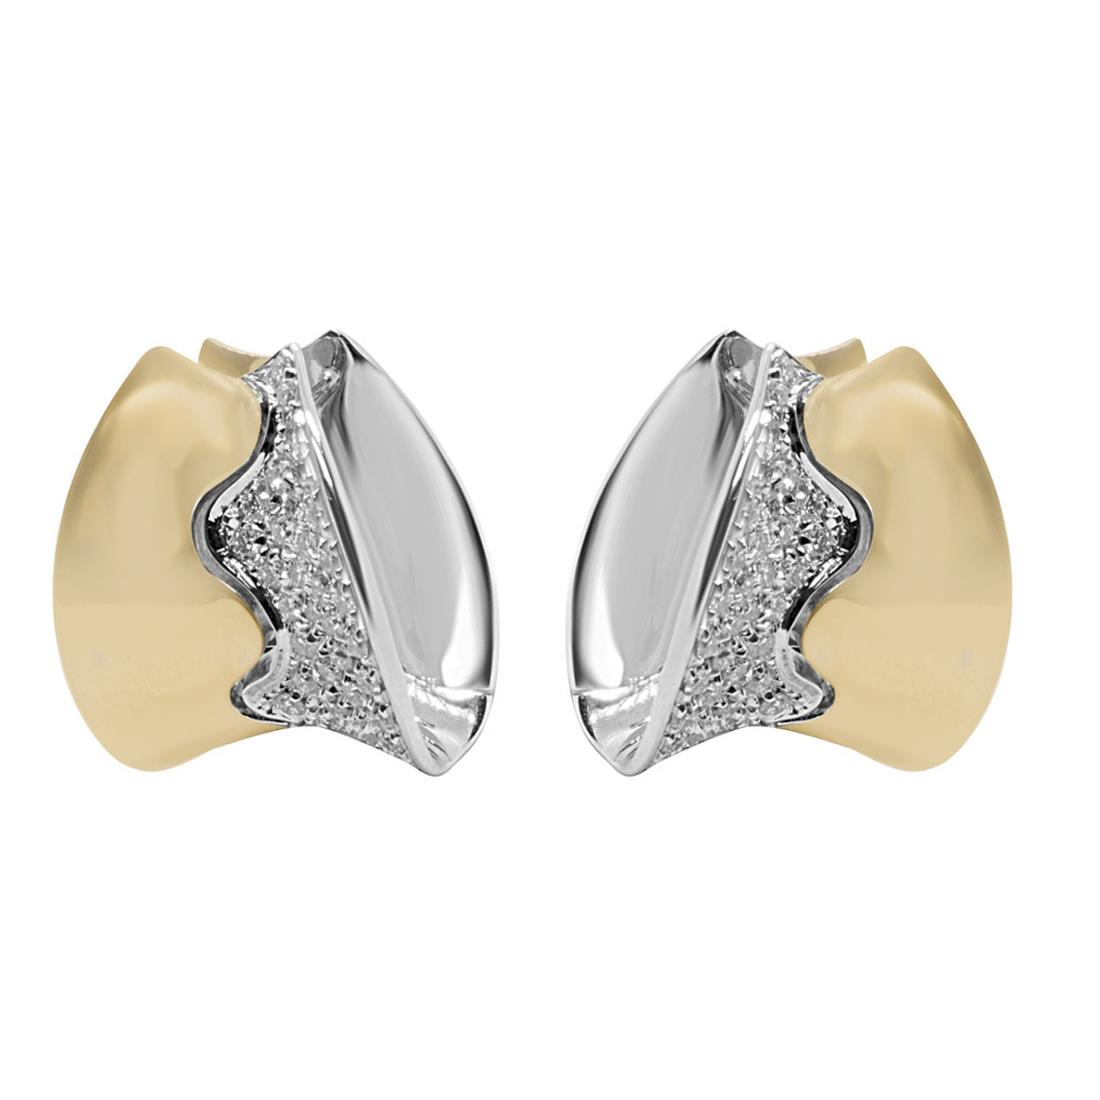 Orecchini Alfieri & St John con diamanti ct 0,65 - ALFIERI & ST.JOHN